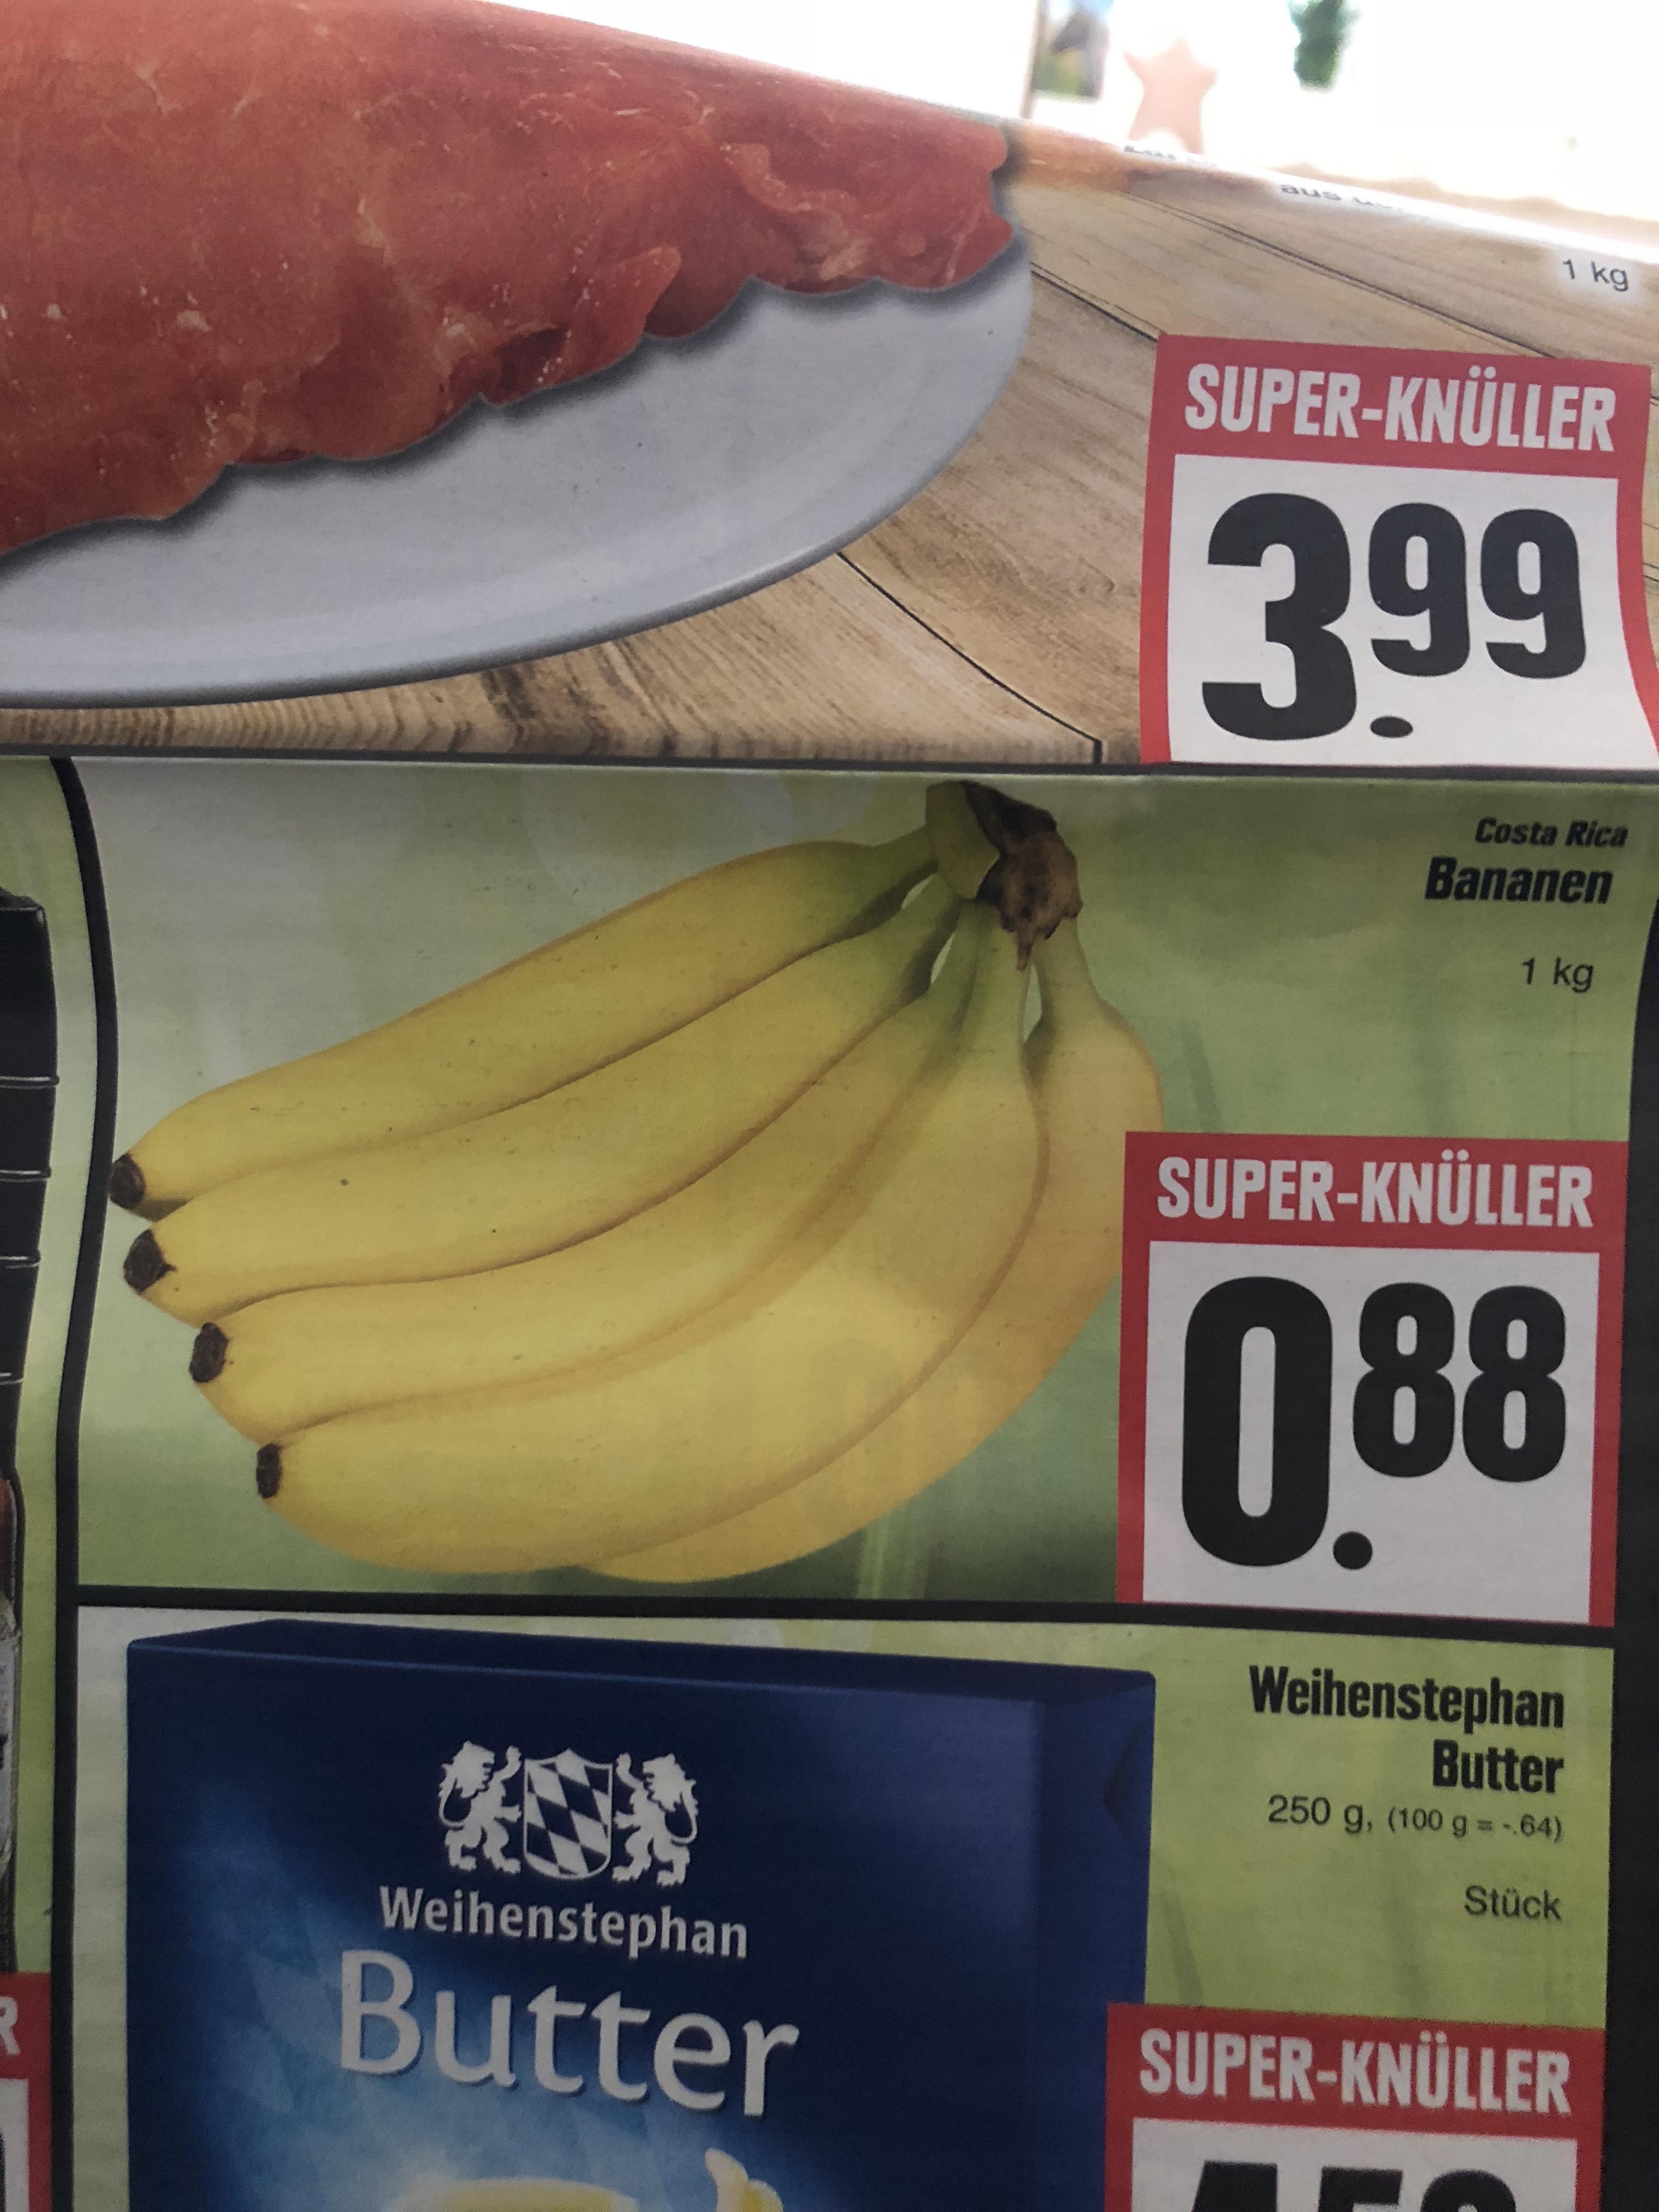 [Lokal Edeka Hessenring] Bananen für 0,88 €